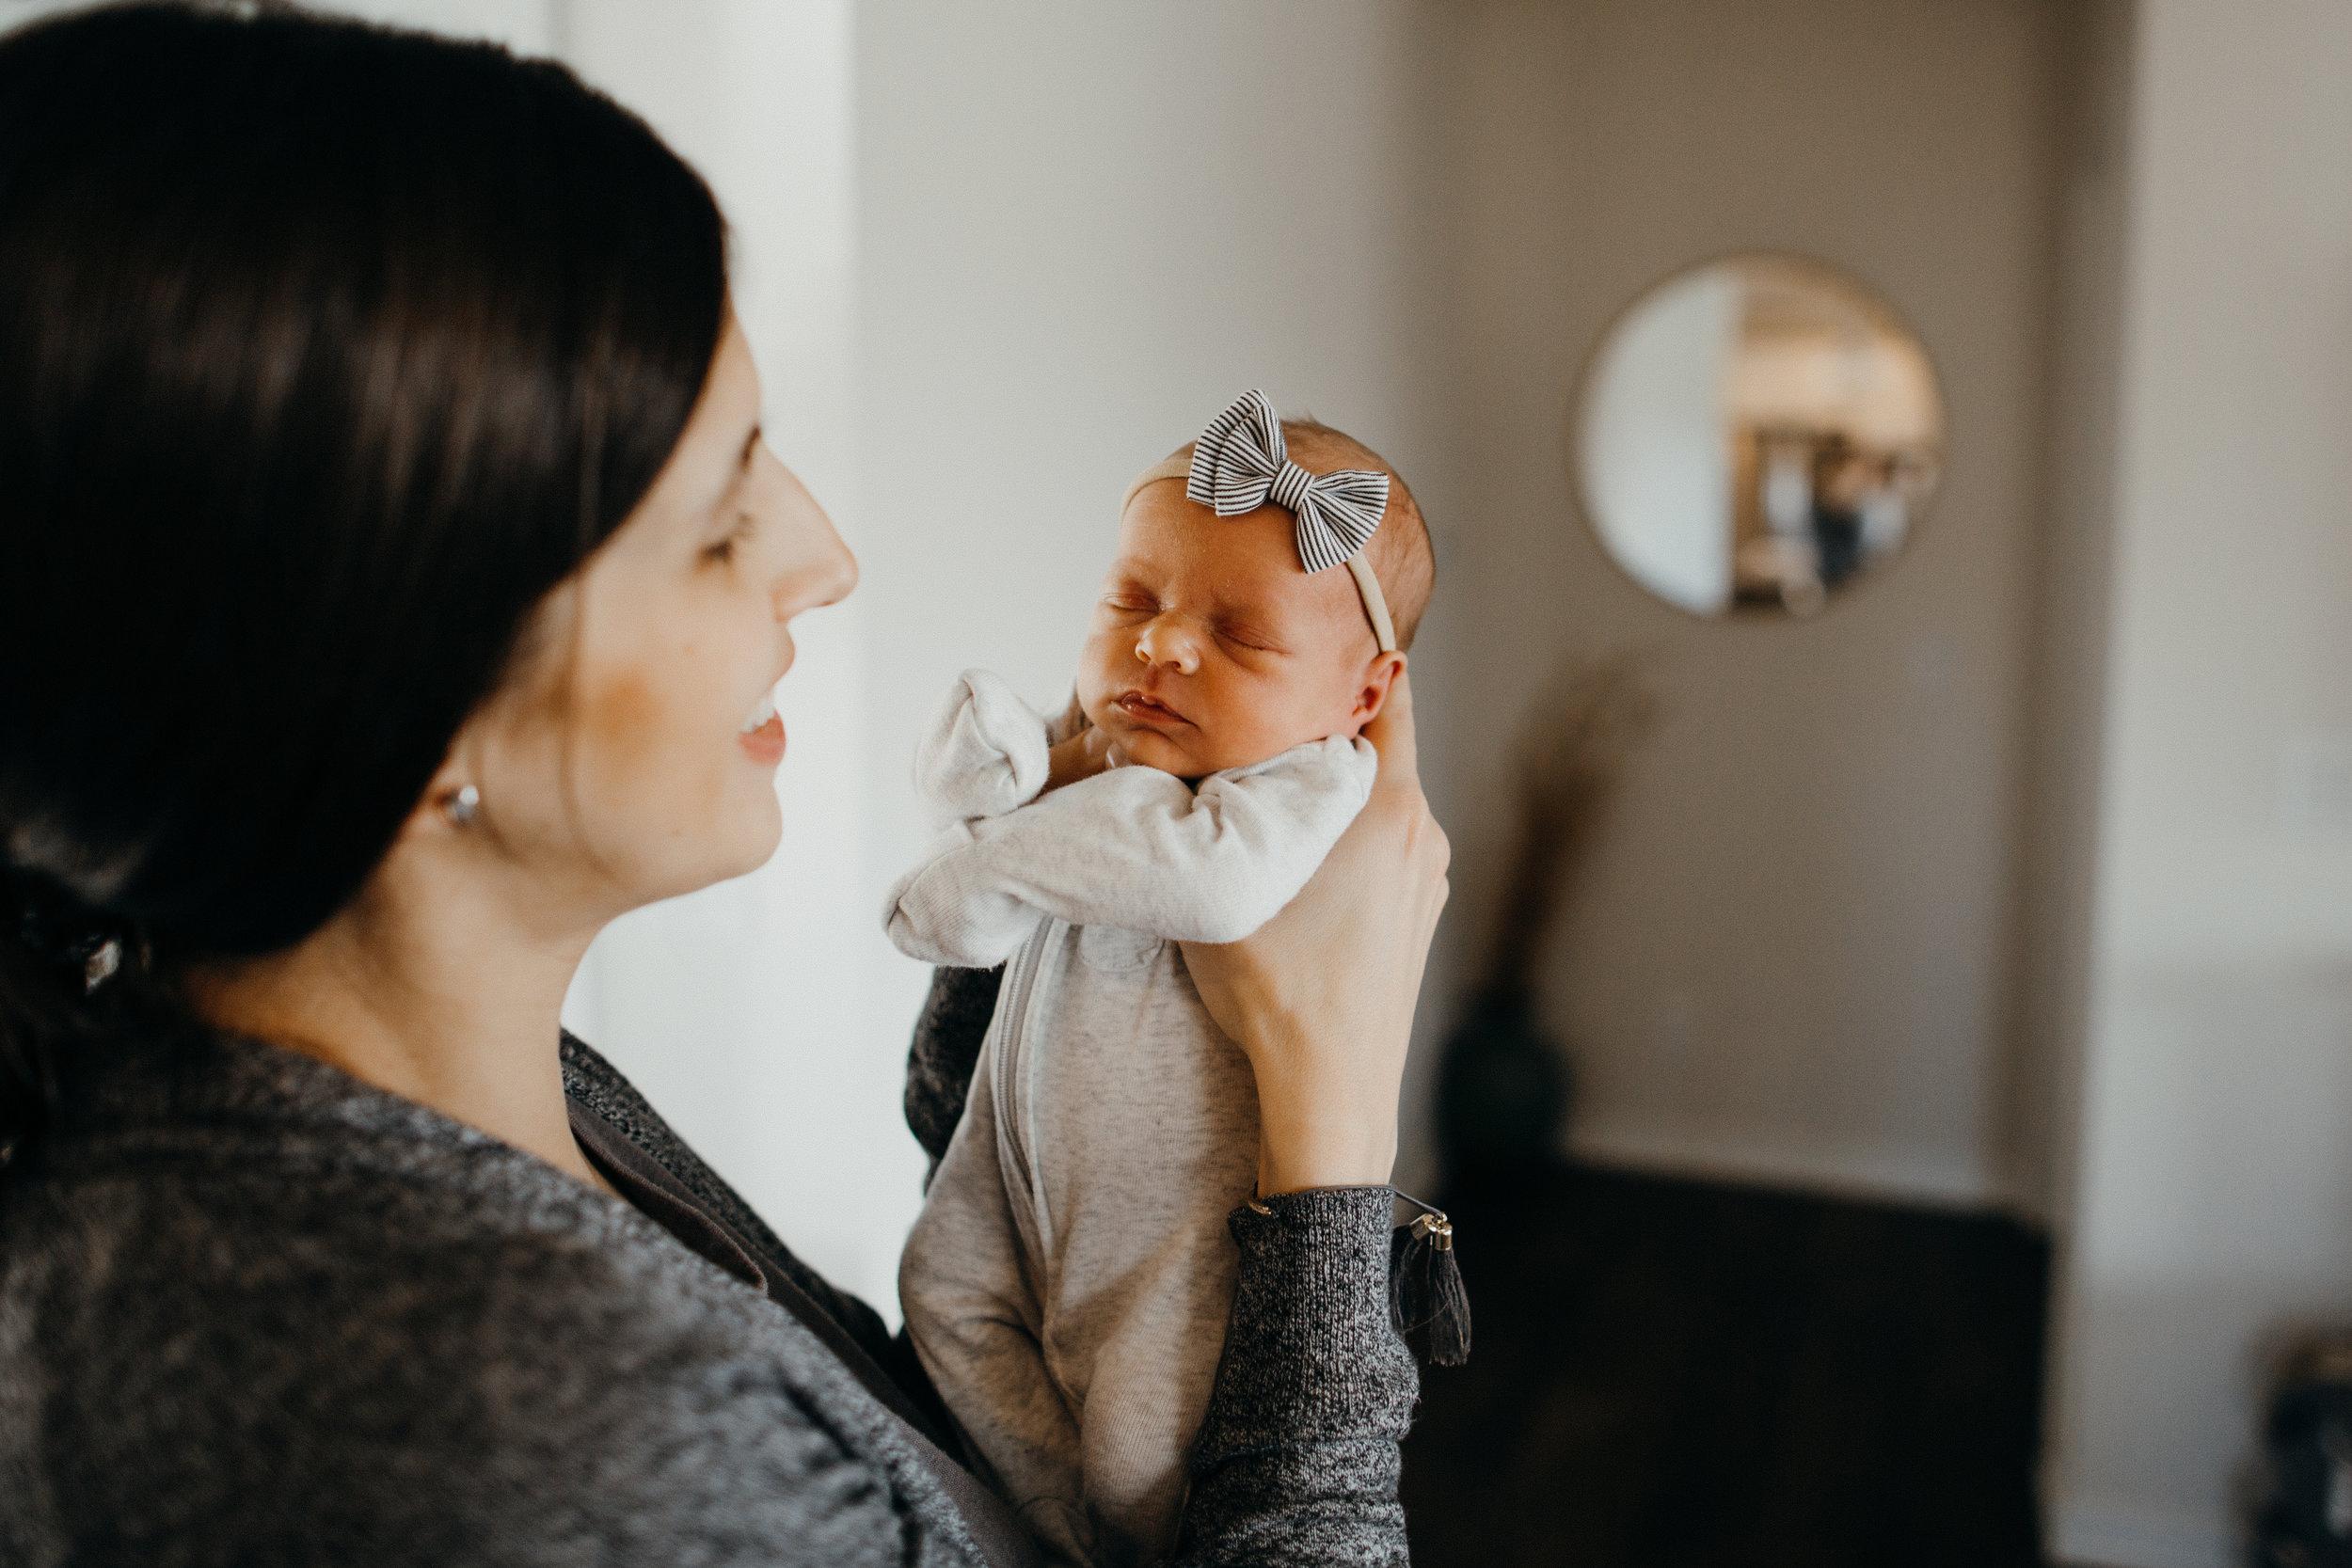 jamieleighmiller_inhome_newborn_photographer_omahanebraska-6.jpg